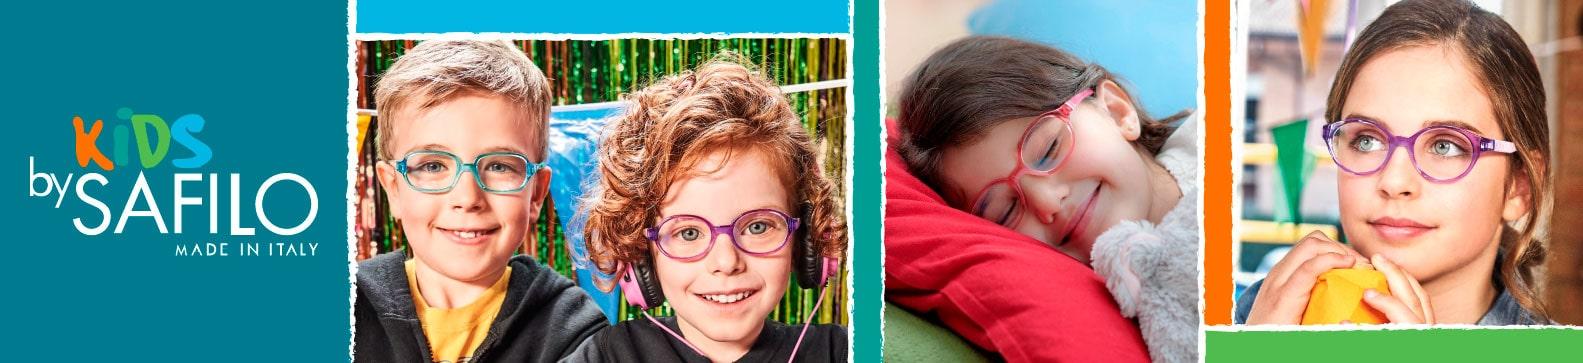 Kids By Safilo Glasses Eyeglasses at Optiwow